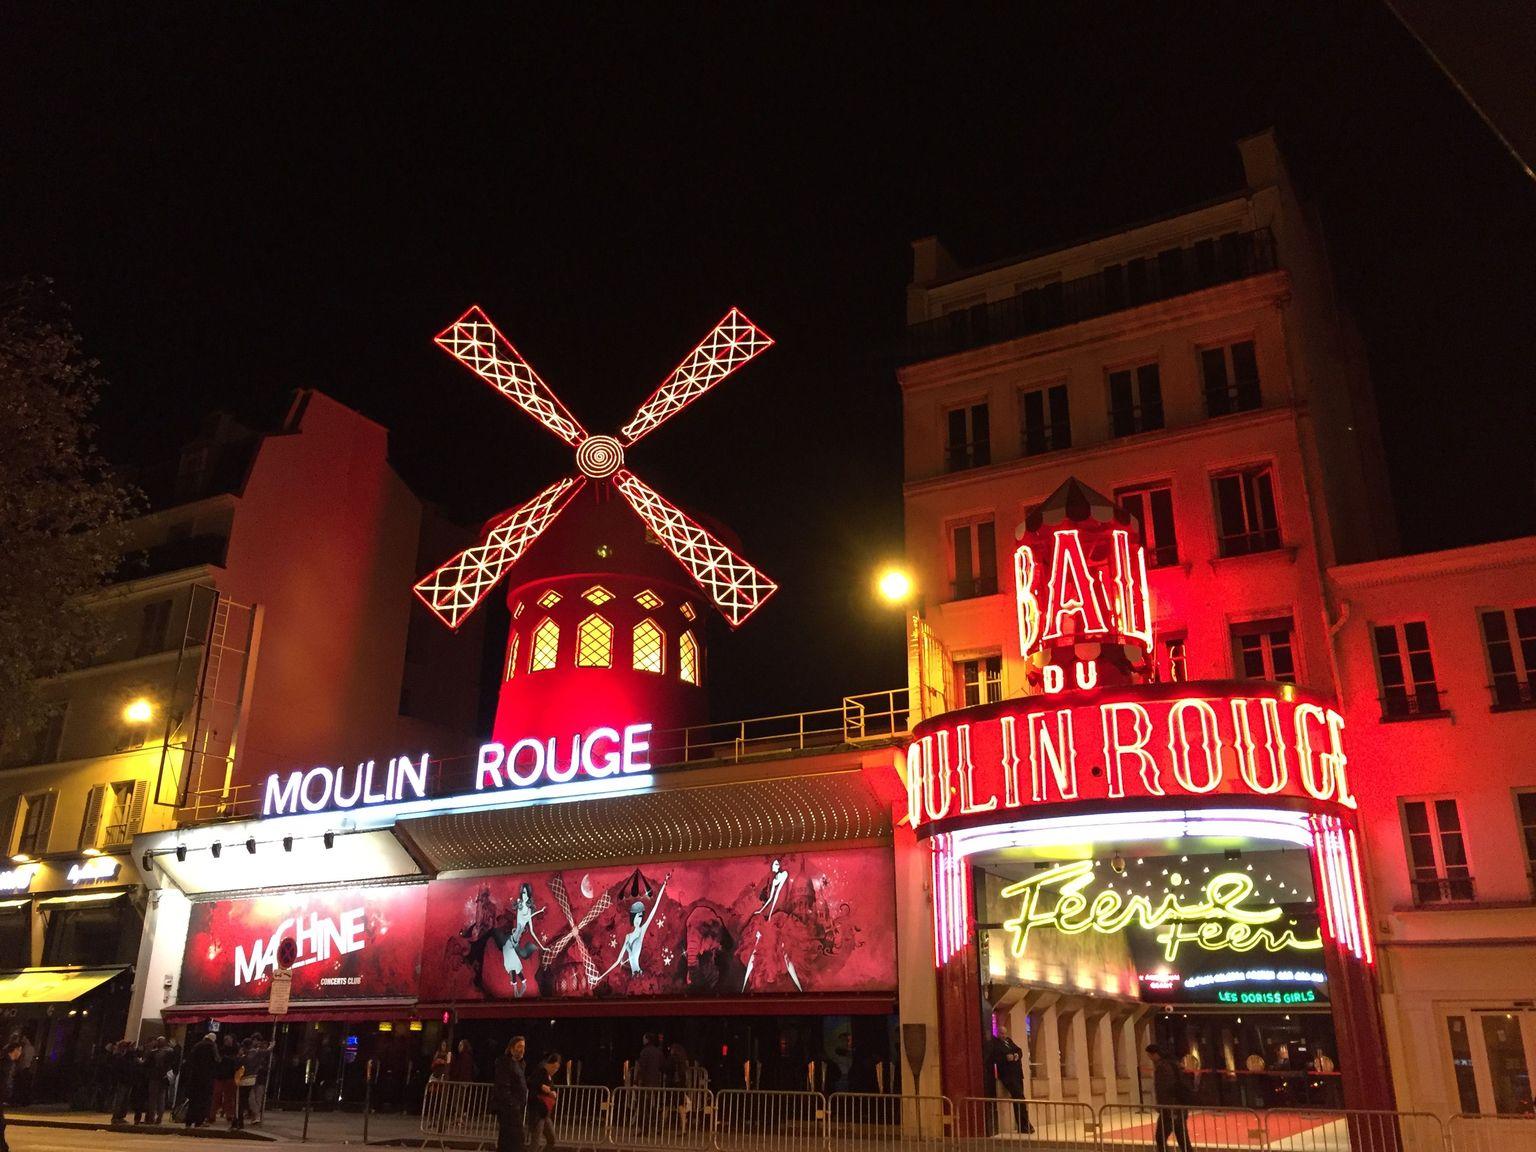 MAIS FOTOS, Paris Moulin Rouge Cabaret Show with VIP Seating & Champagne